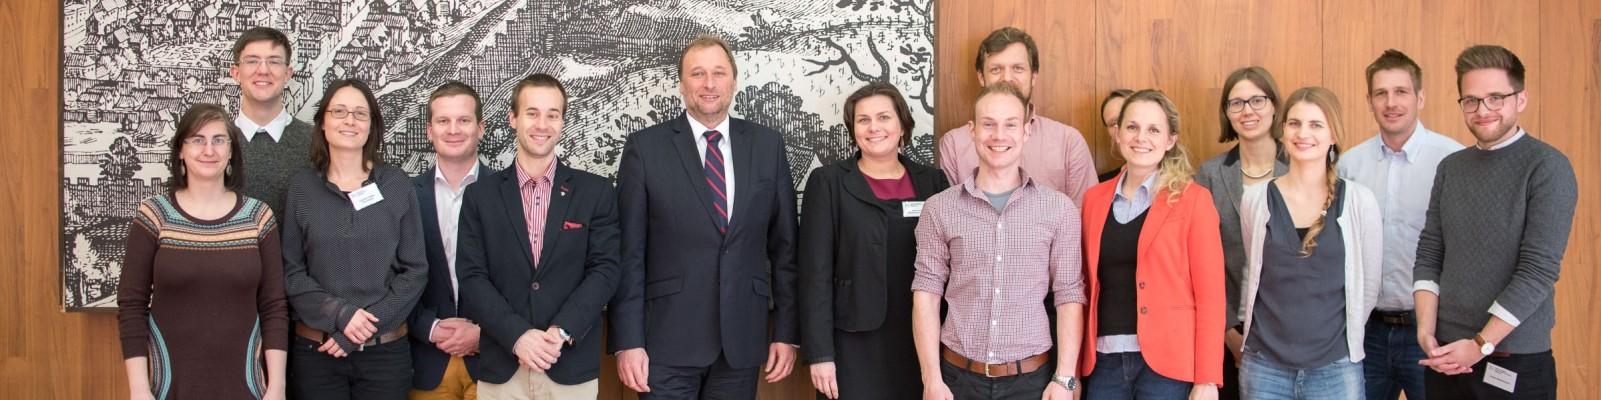 Czech-German Young Professionals Program